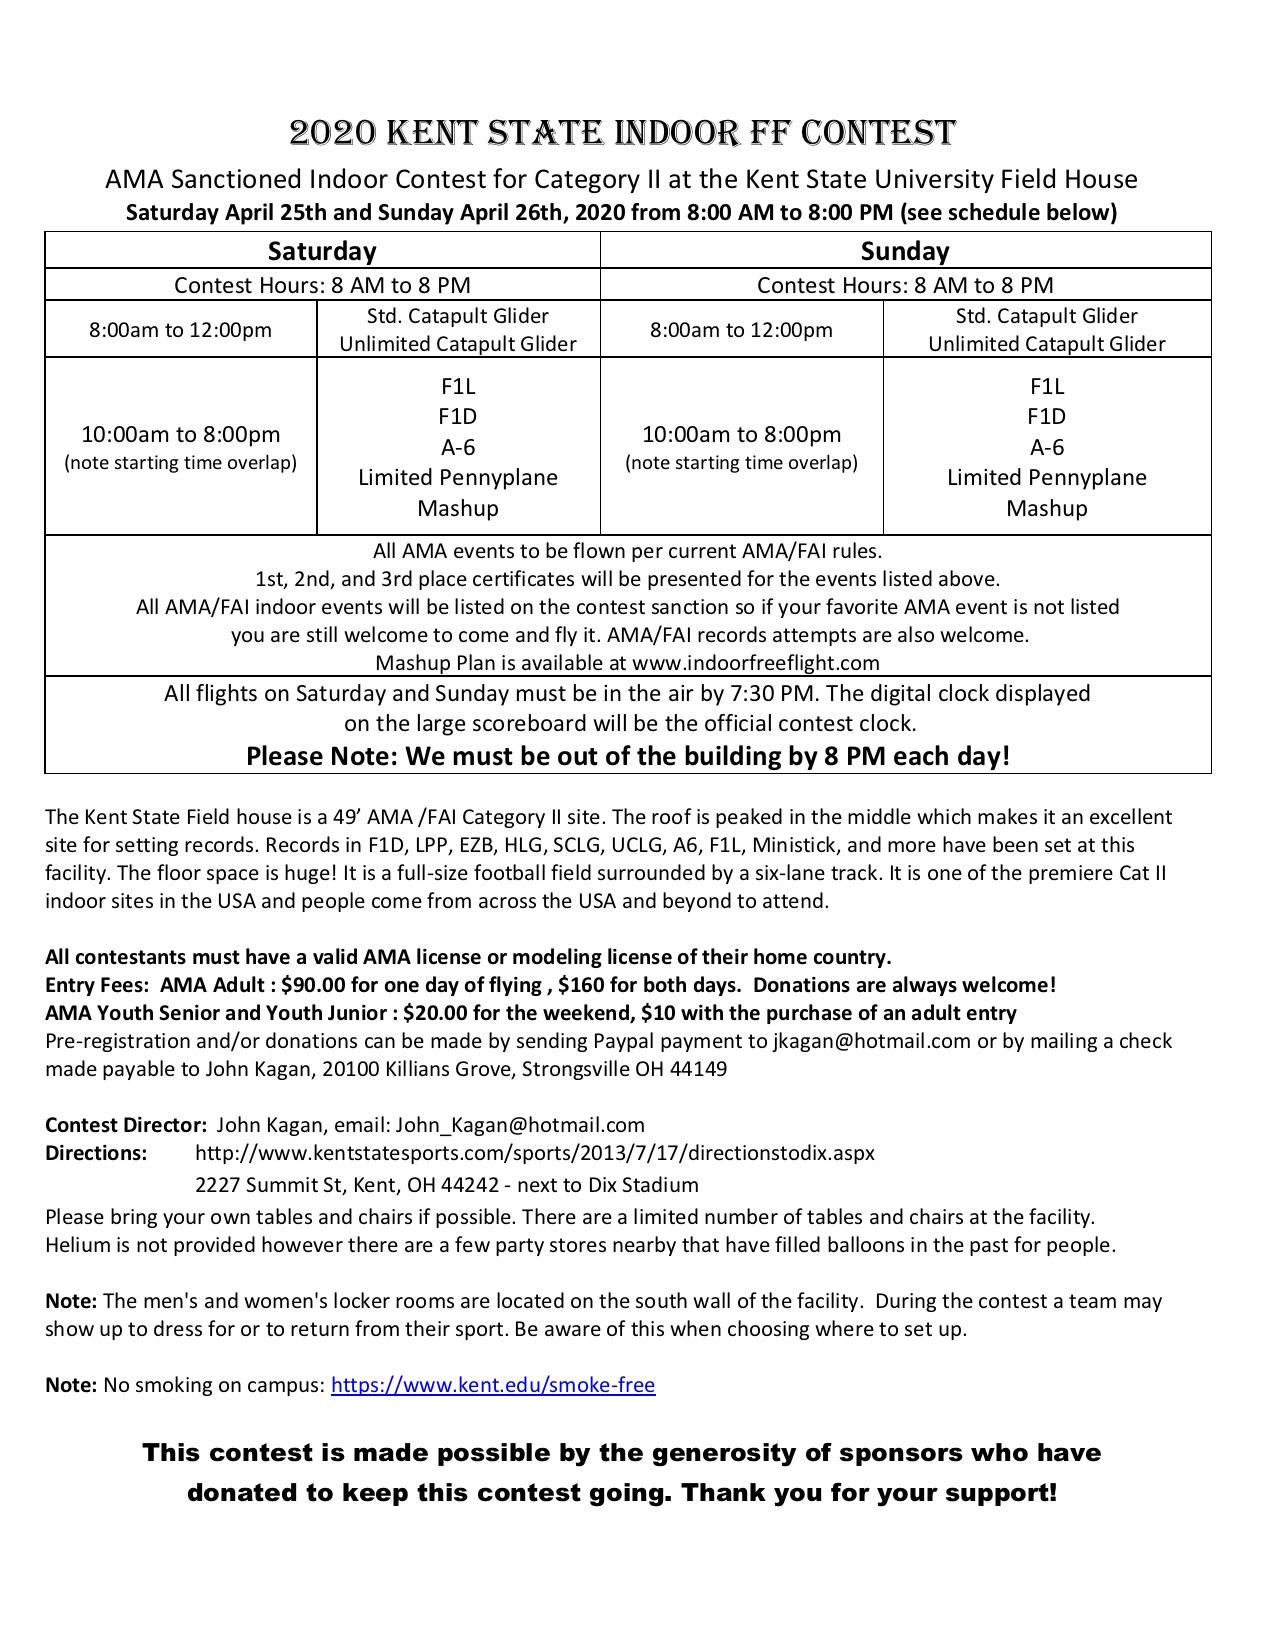 Kent_2020_ContestV1 copy.jpg